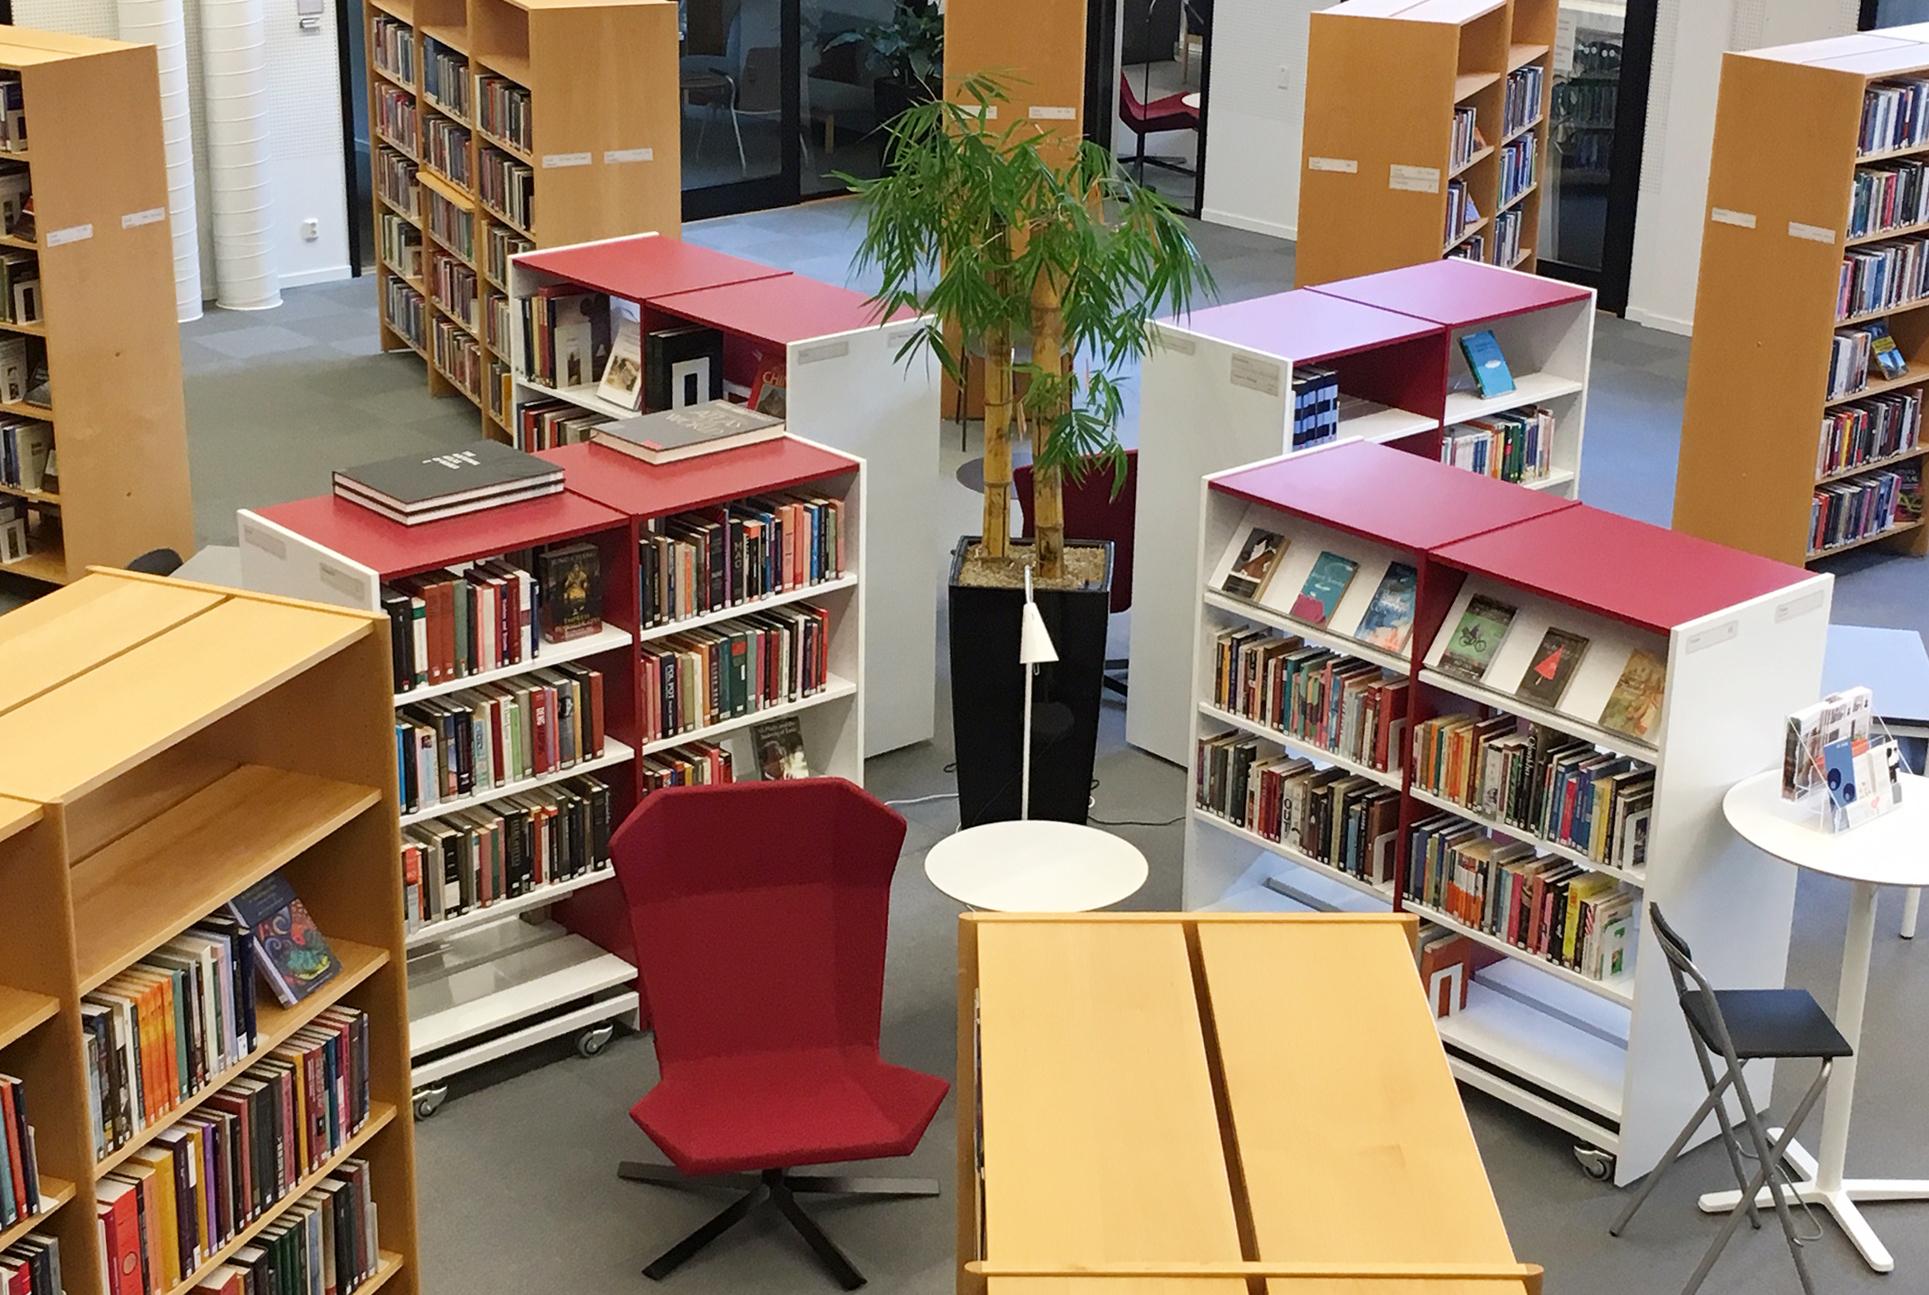 240 library birdview webb